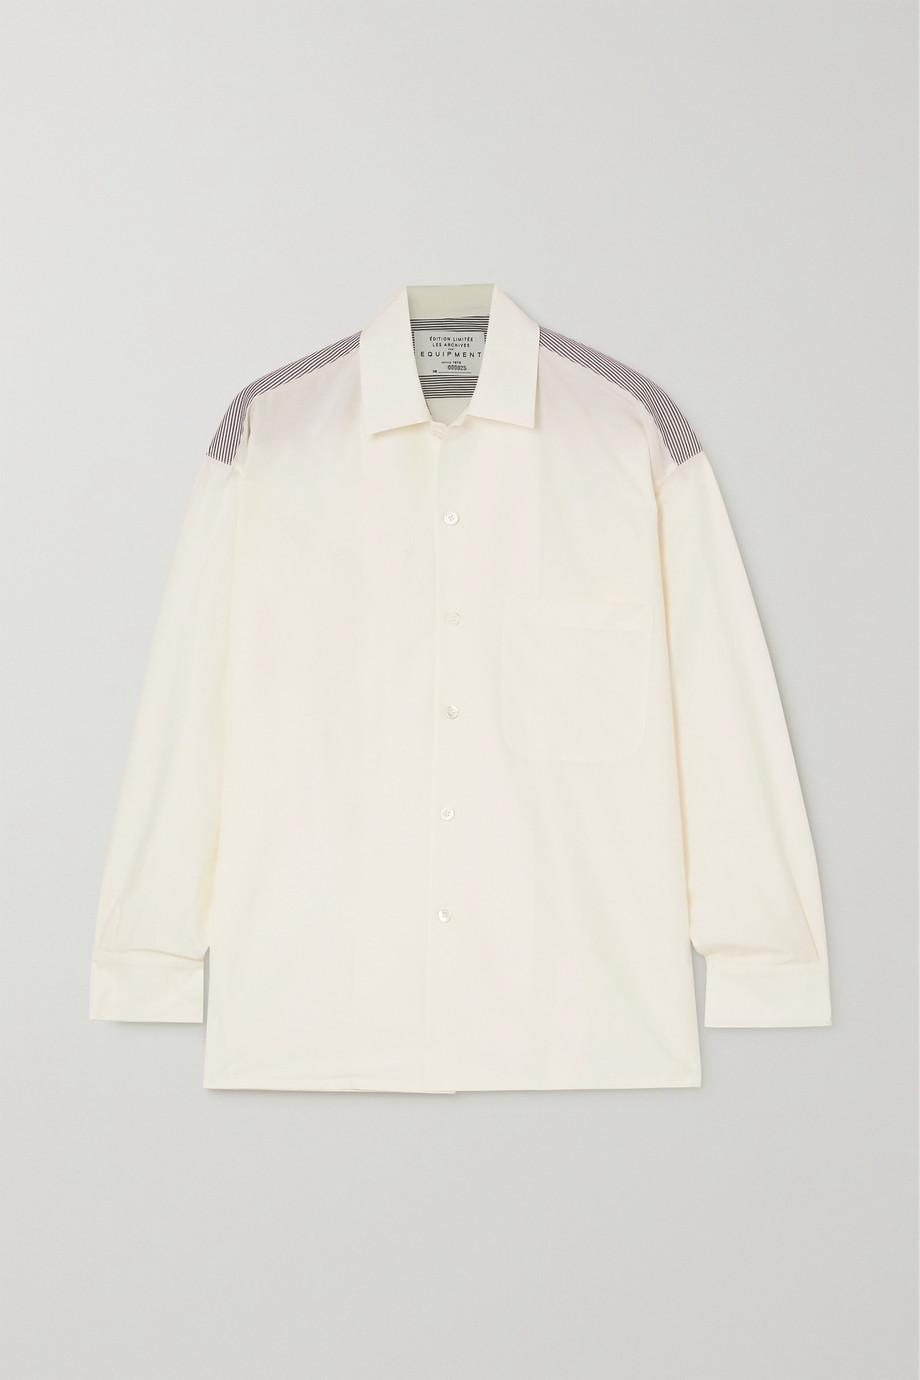 EQUIPMENT Archive 6 条纹纯棉府绸棉丝混纺衬衫